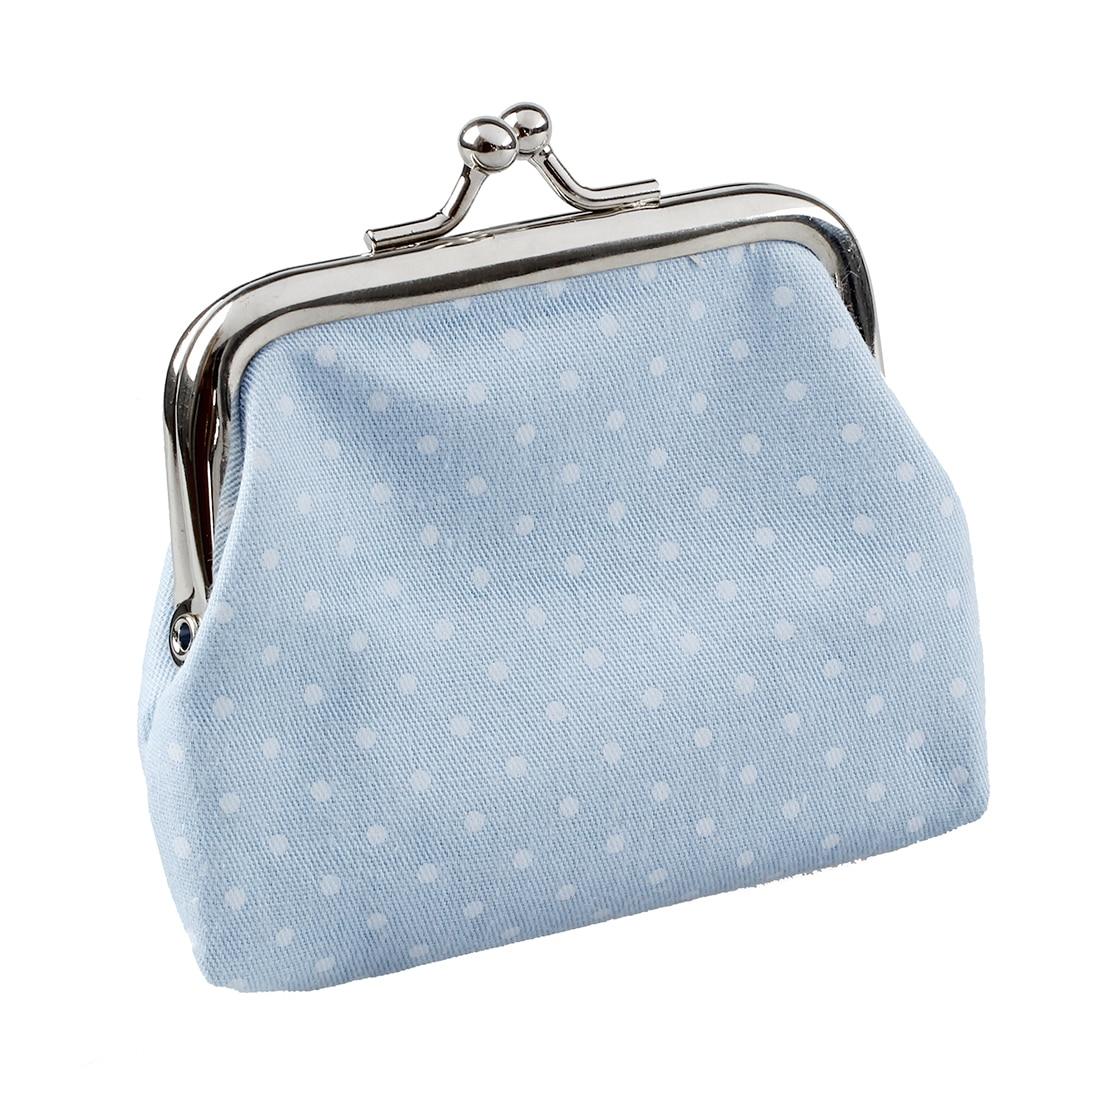 HEBA Popular Cute girls Wallet Clutch Change Purse key/coins bag Mini Handbag Pouch